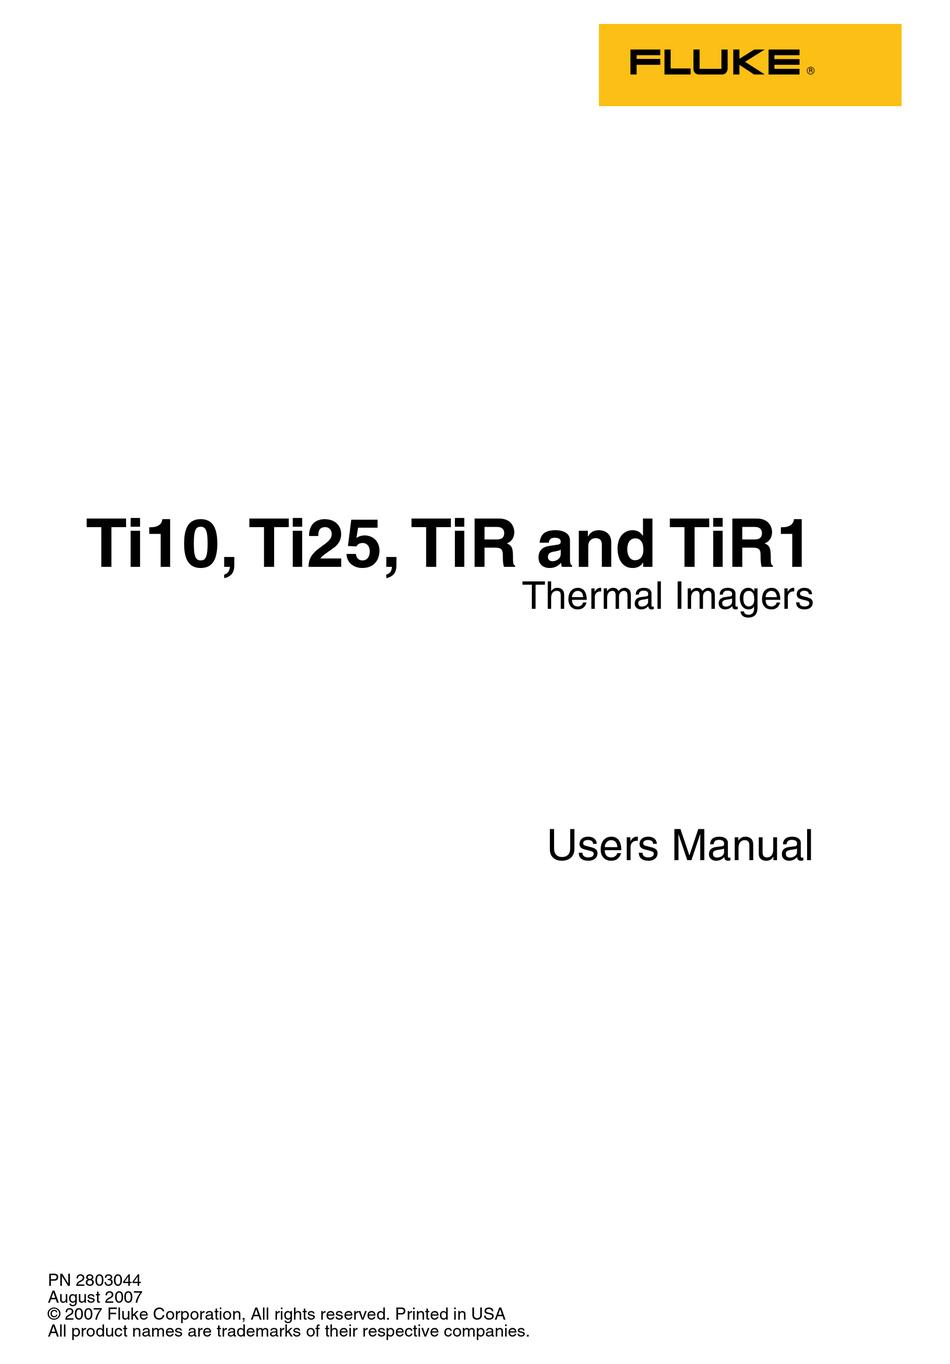 FLUKE THERMAL IMAGERS TI10 USER MANUAL Pdf Download